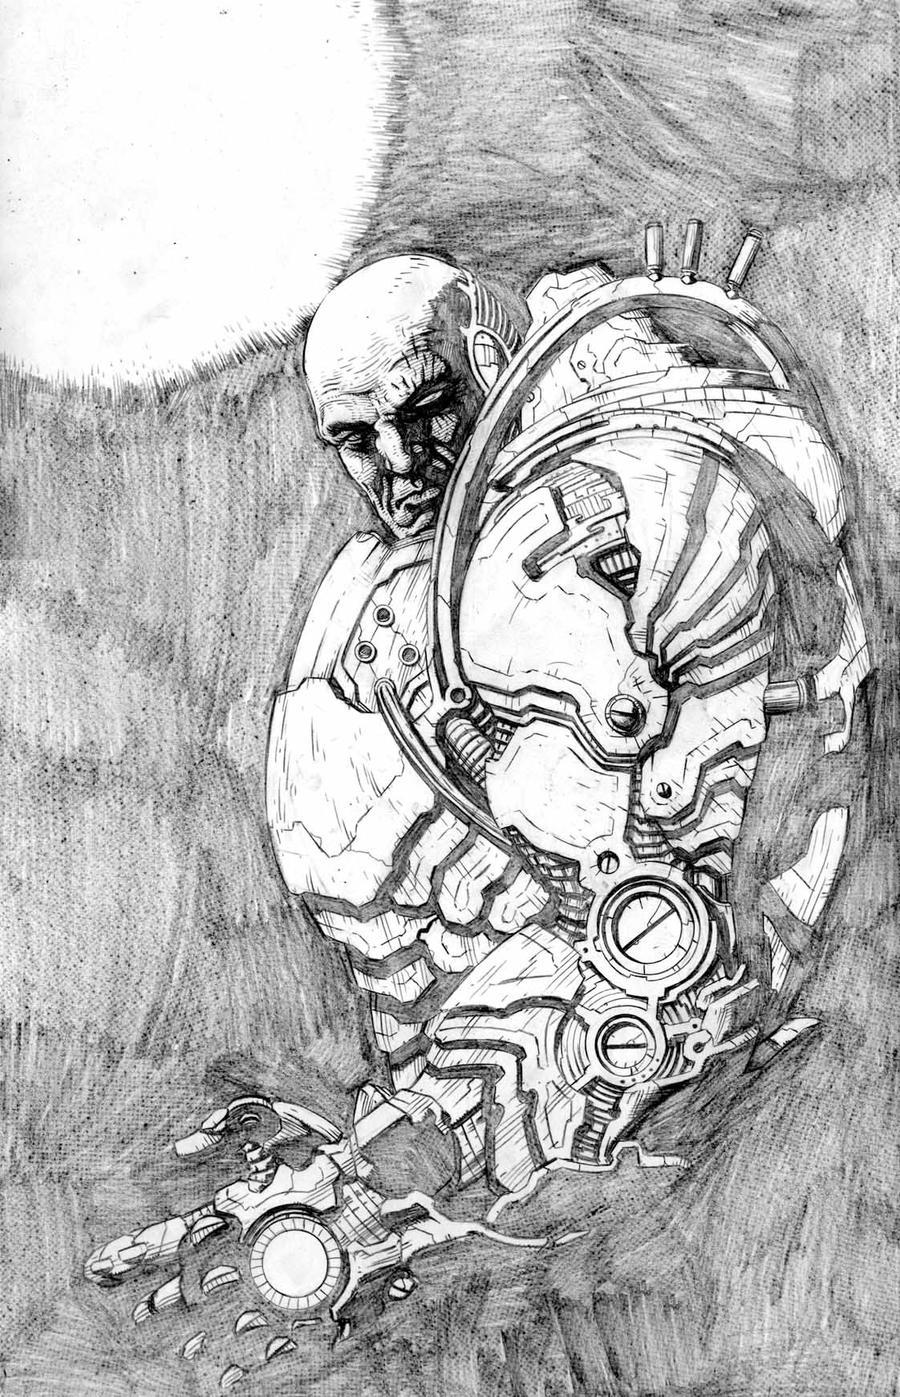 Luthor by santiagocomics